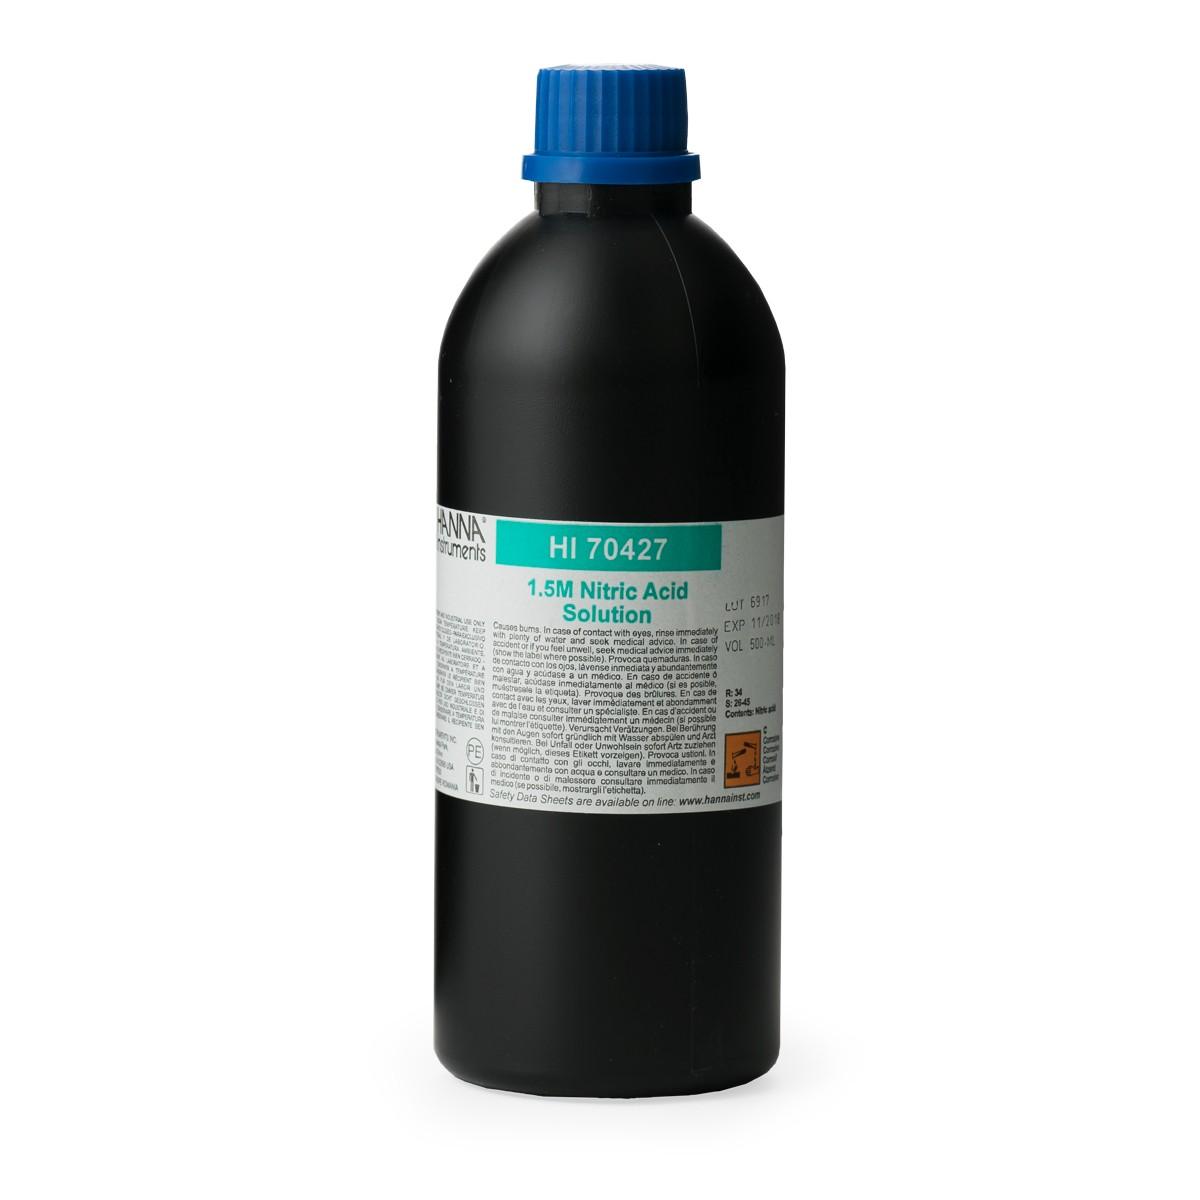 Nitric Acid Solution 1.5M, 500 mL - HI70427